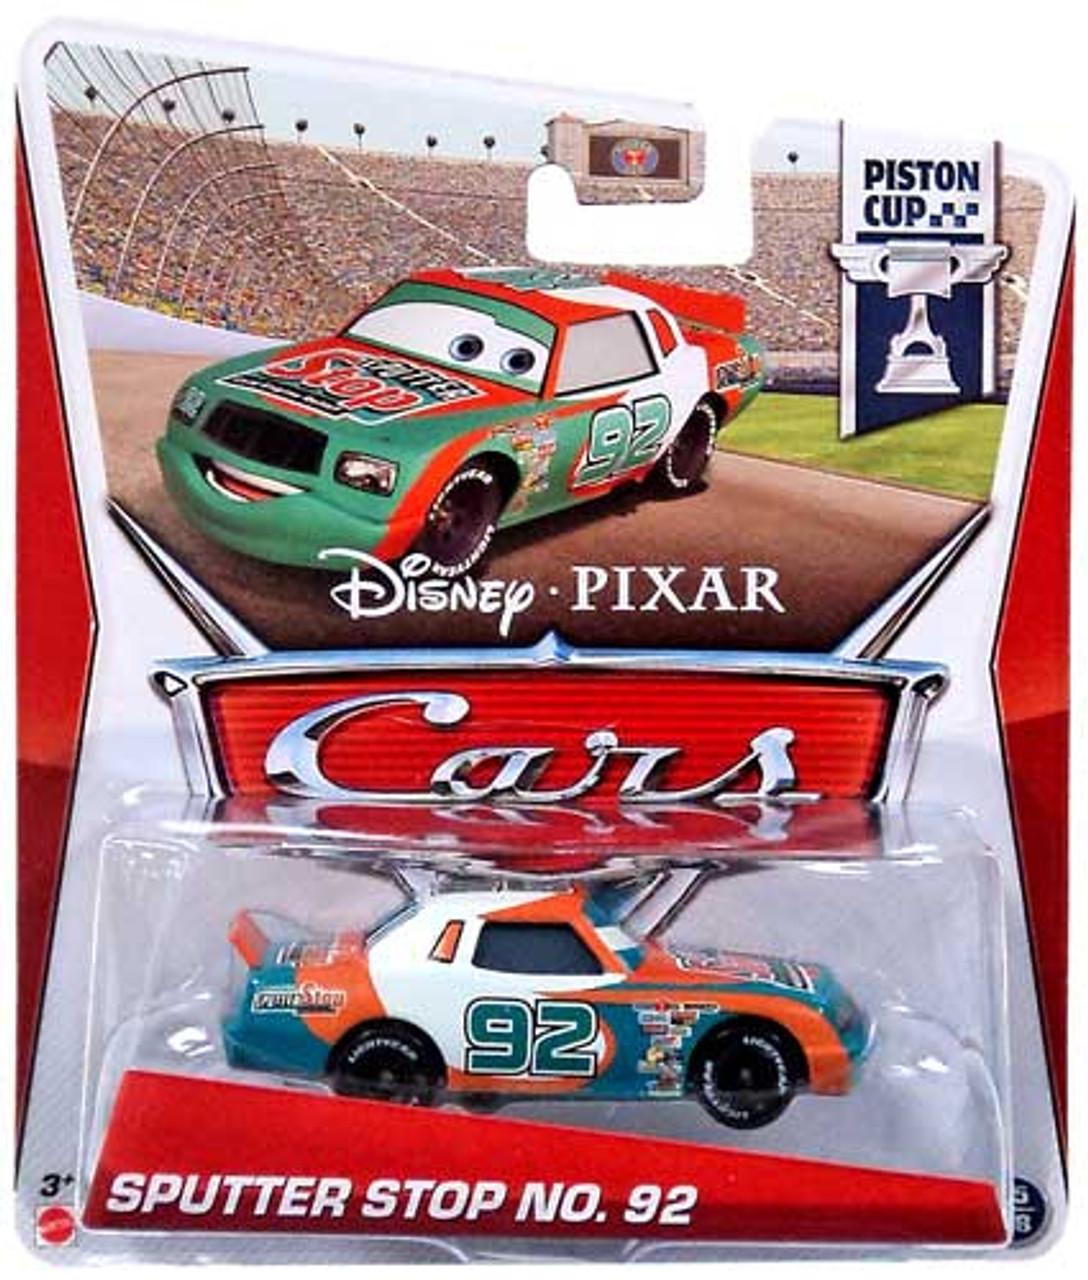 Disney Pixar Cars Series 3 Sputter Stop No 92 155 Diecast Car Mattel Toys Toywiz